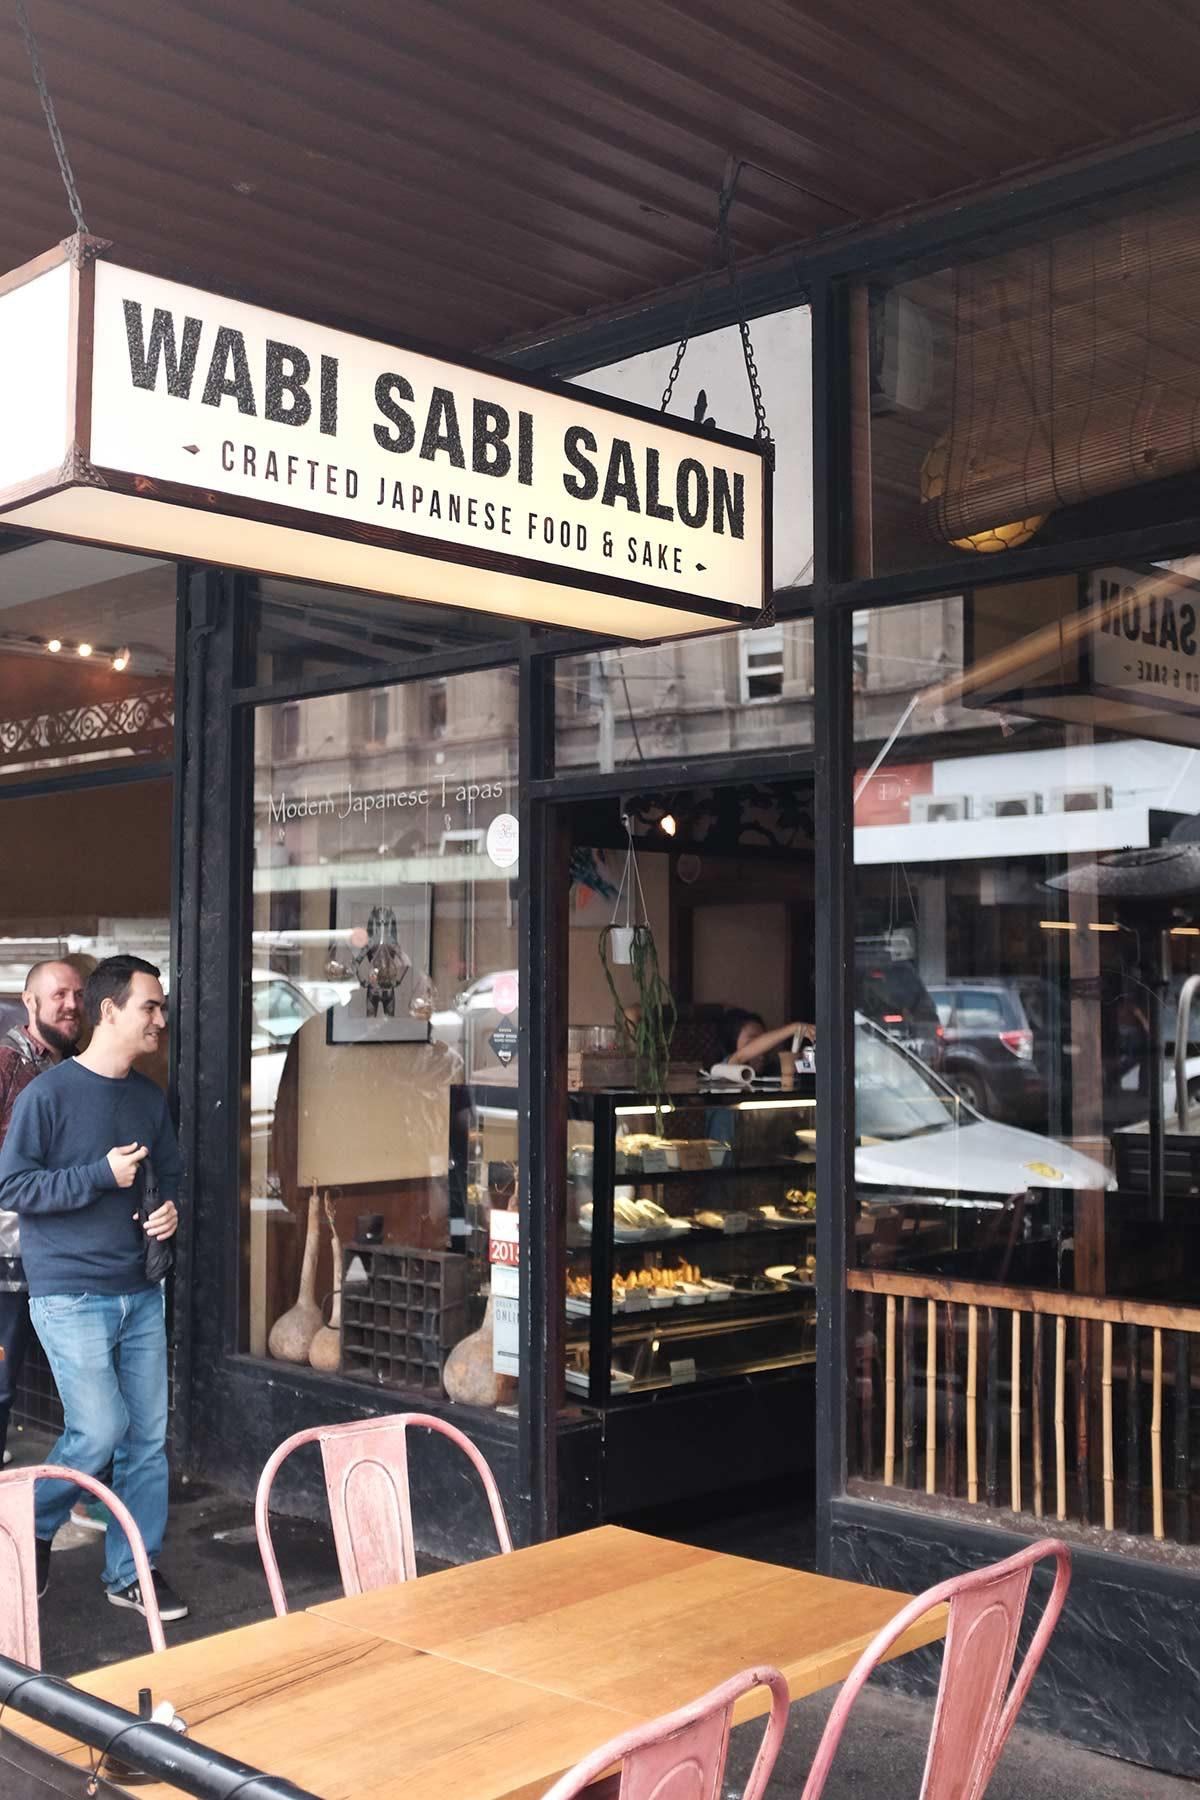 Wabi Sabi Salon